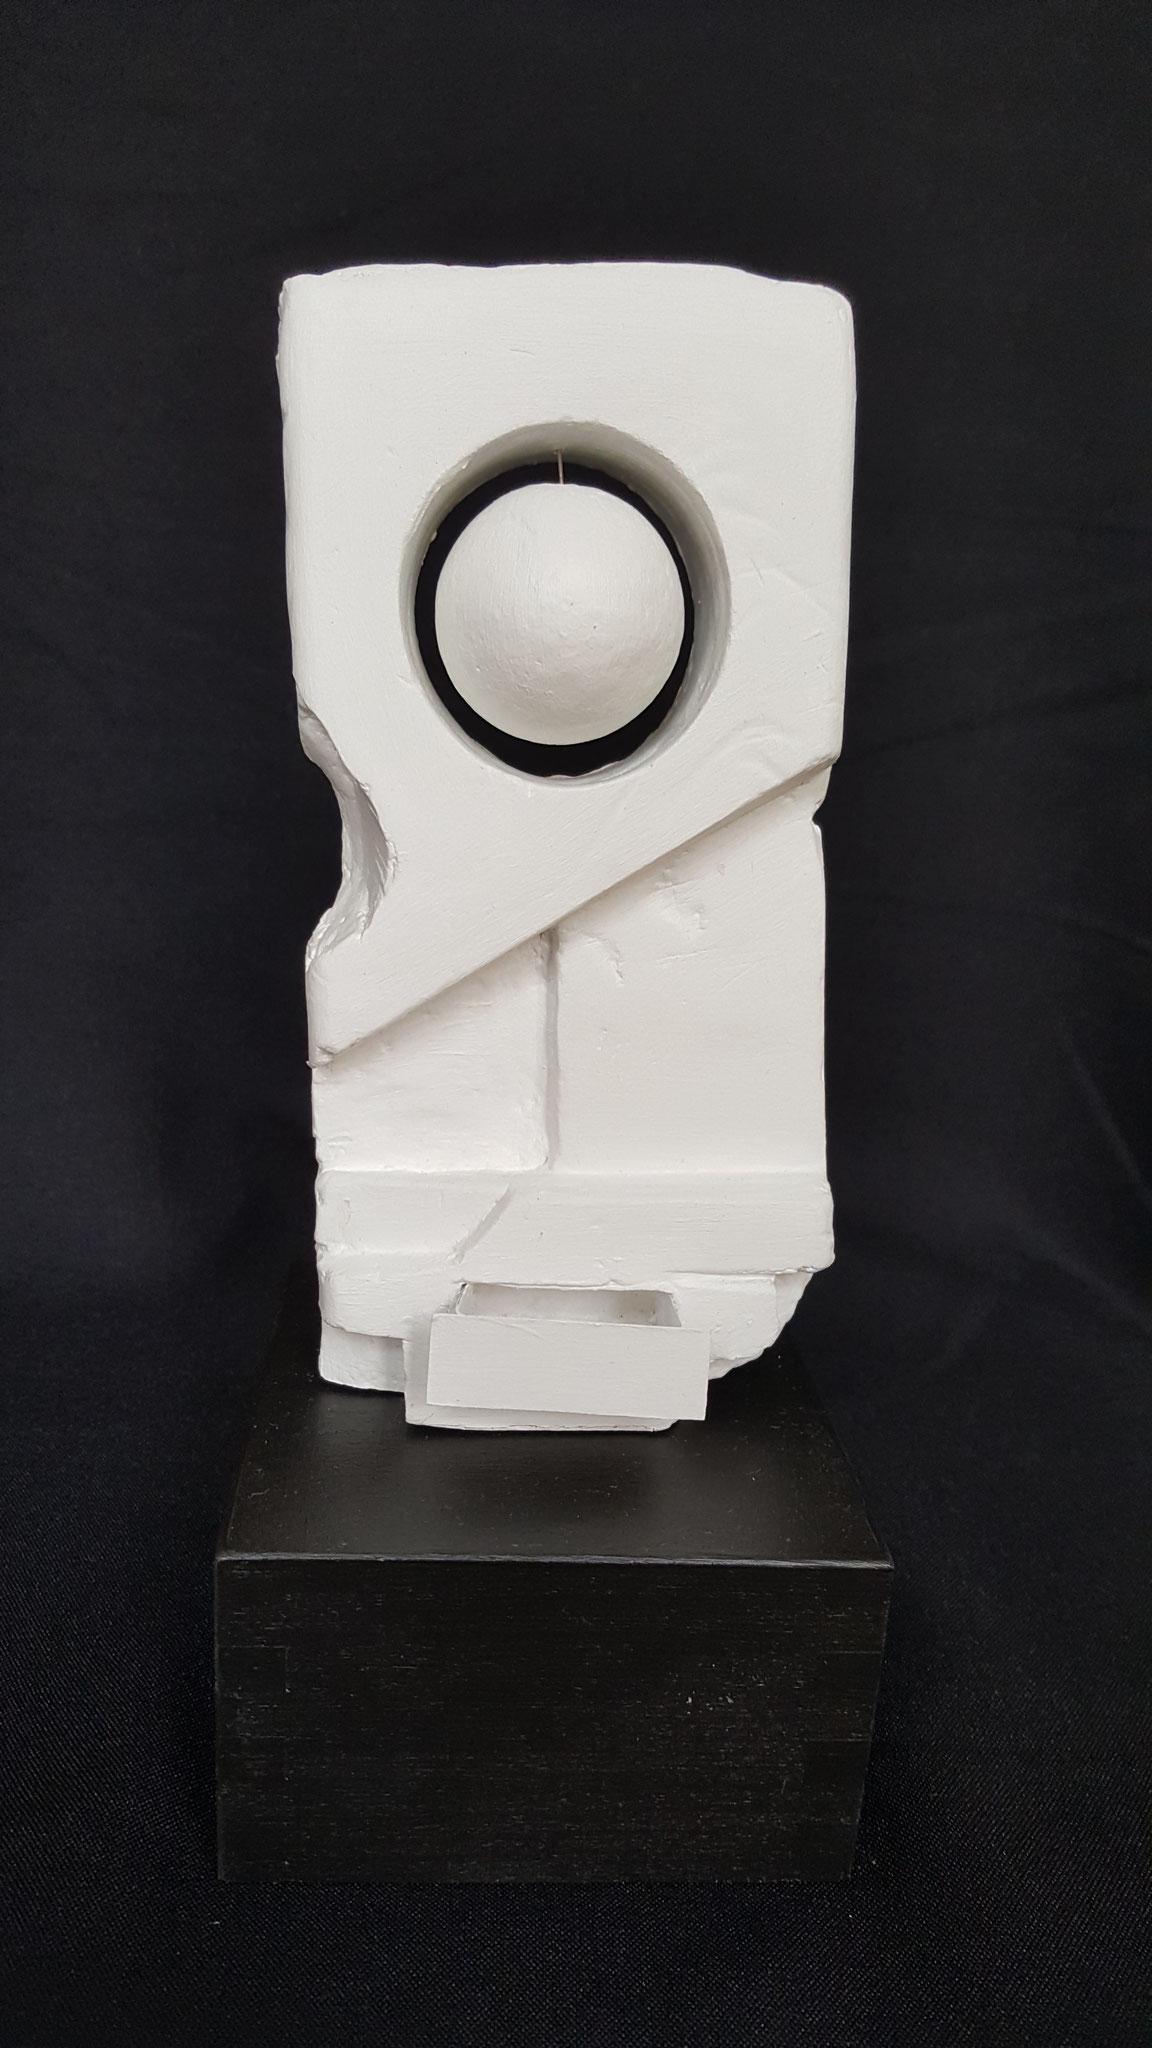 Incrustaciones, 2018, 25 x 10 x 10 cm, Object